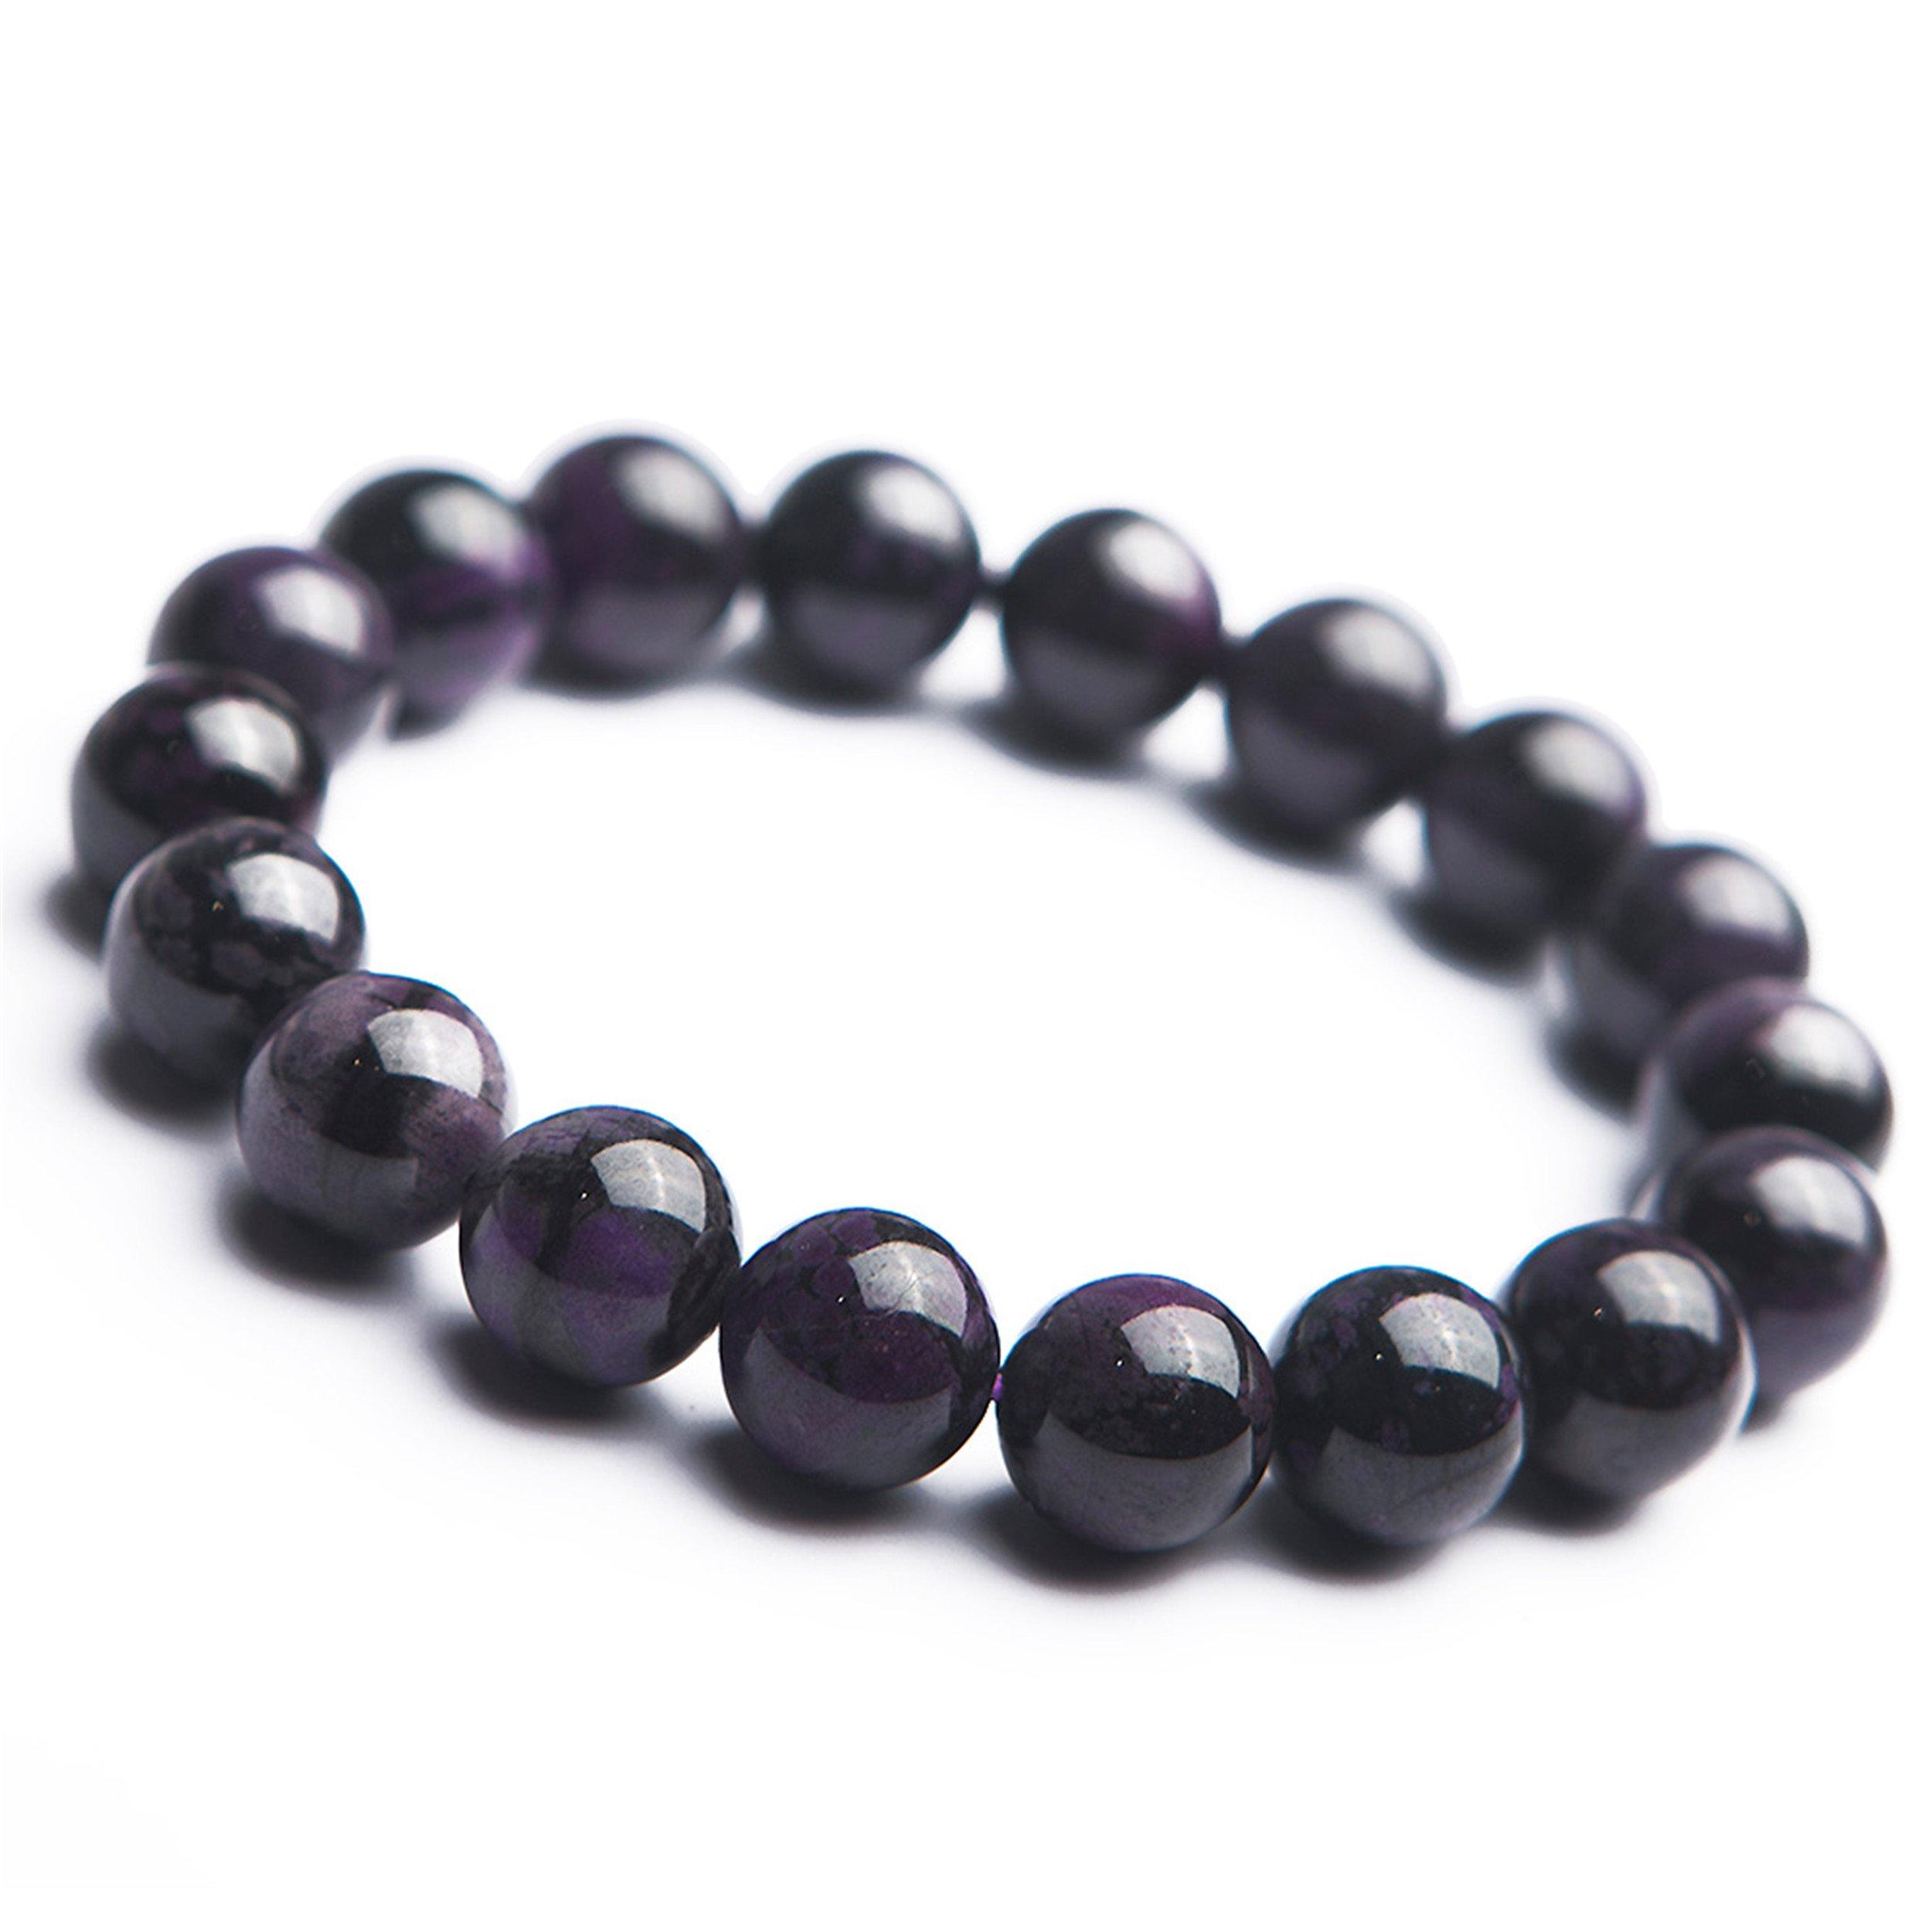 South African Purple Natural Sugilite Gemstone Round Bead Bracelet 13mm